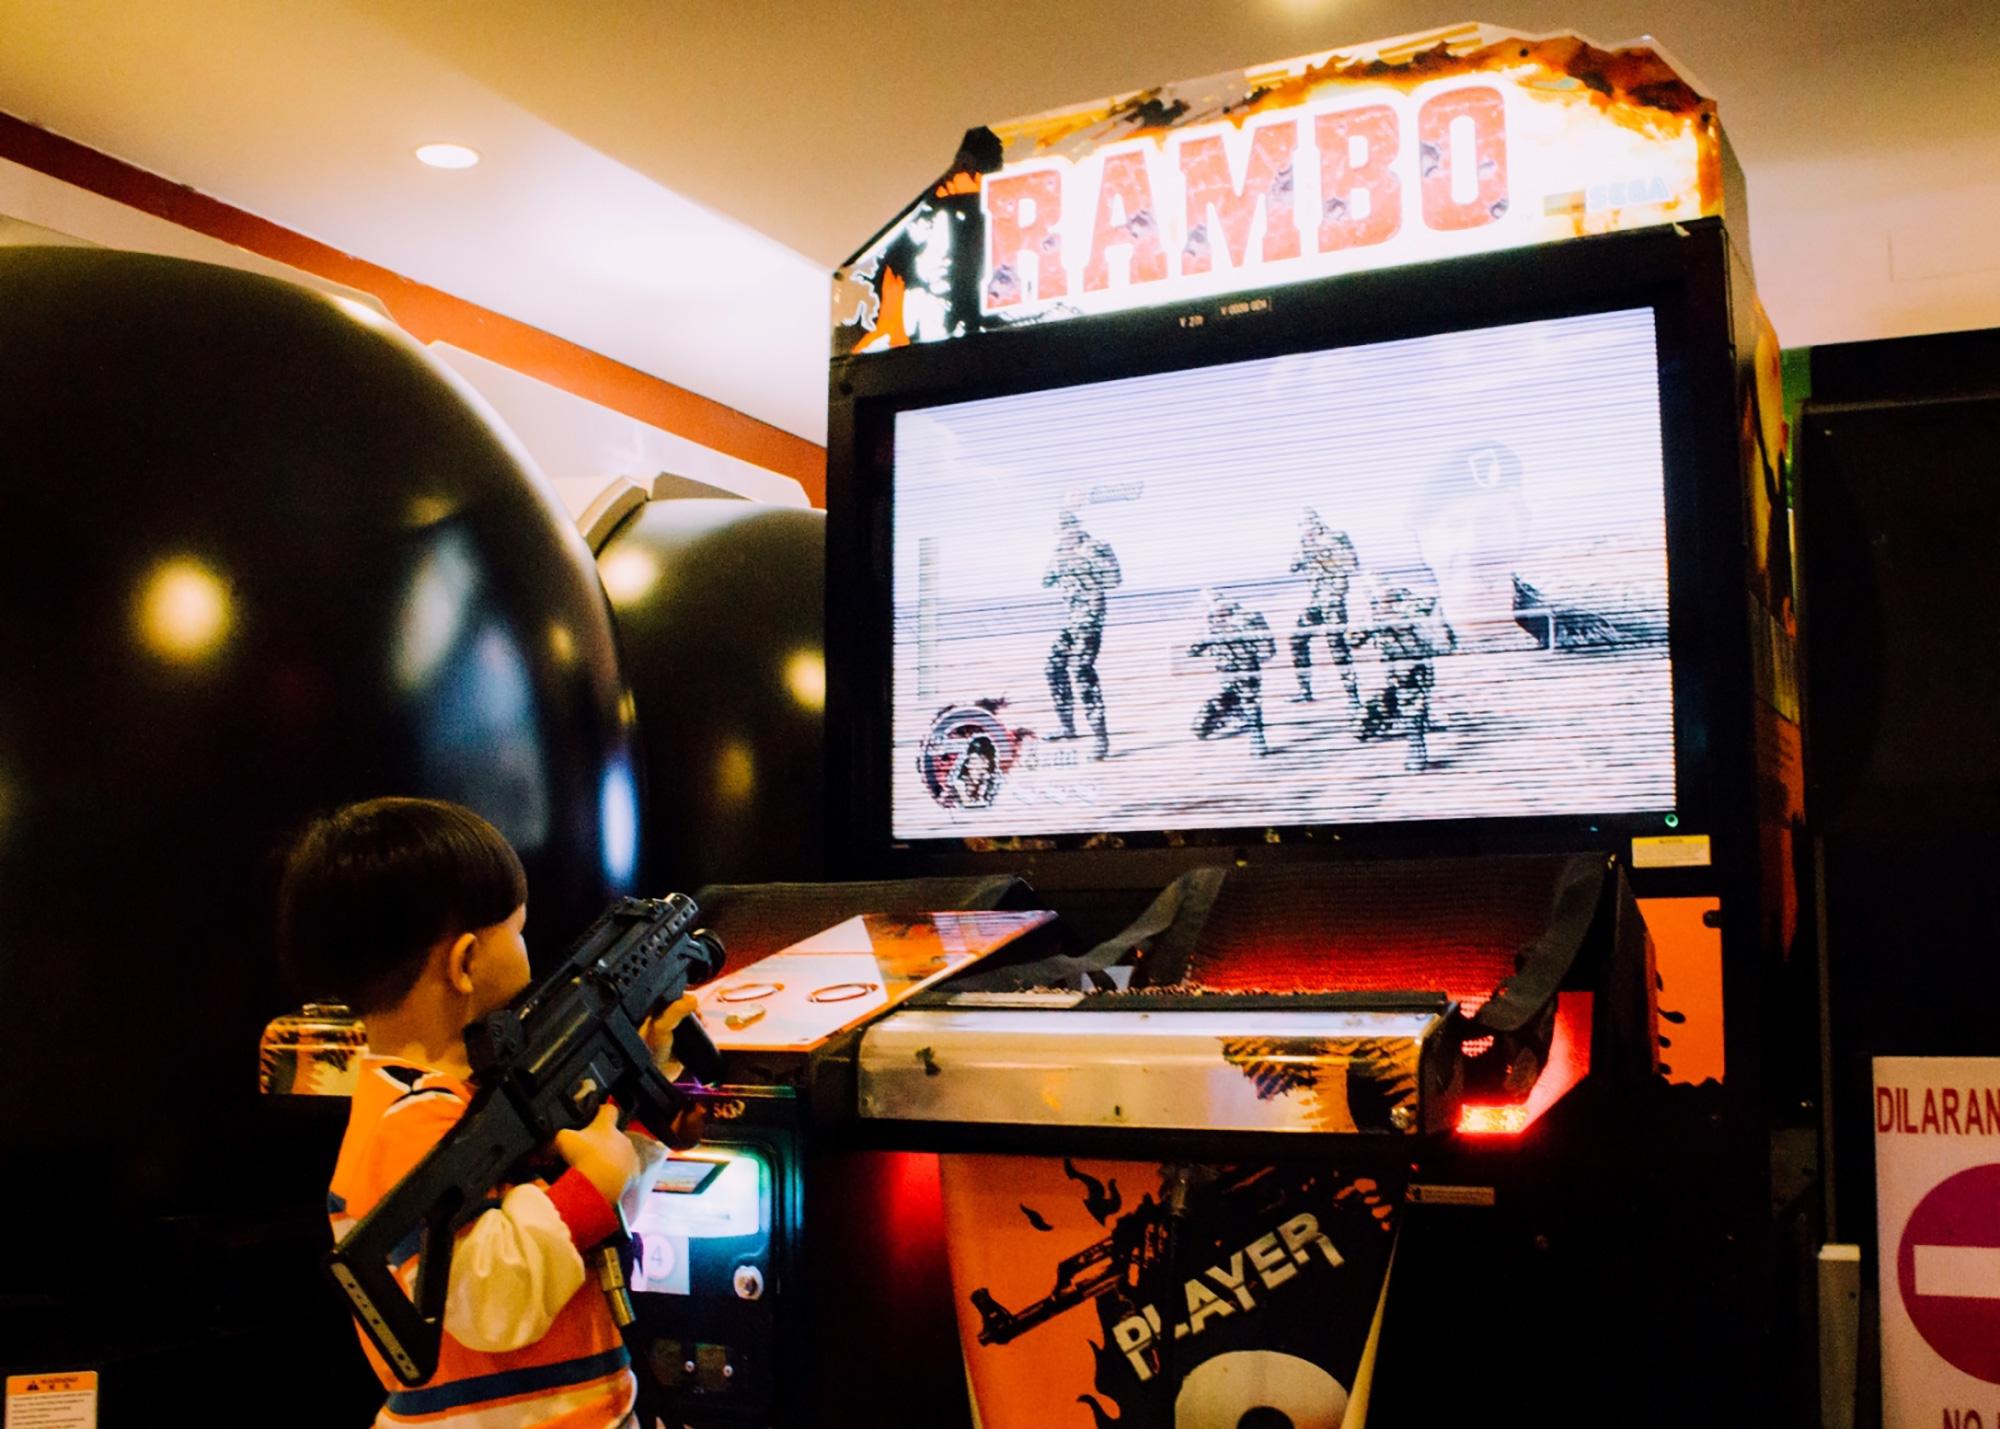 2-rambo-arcade